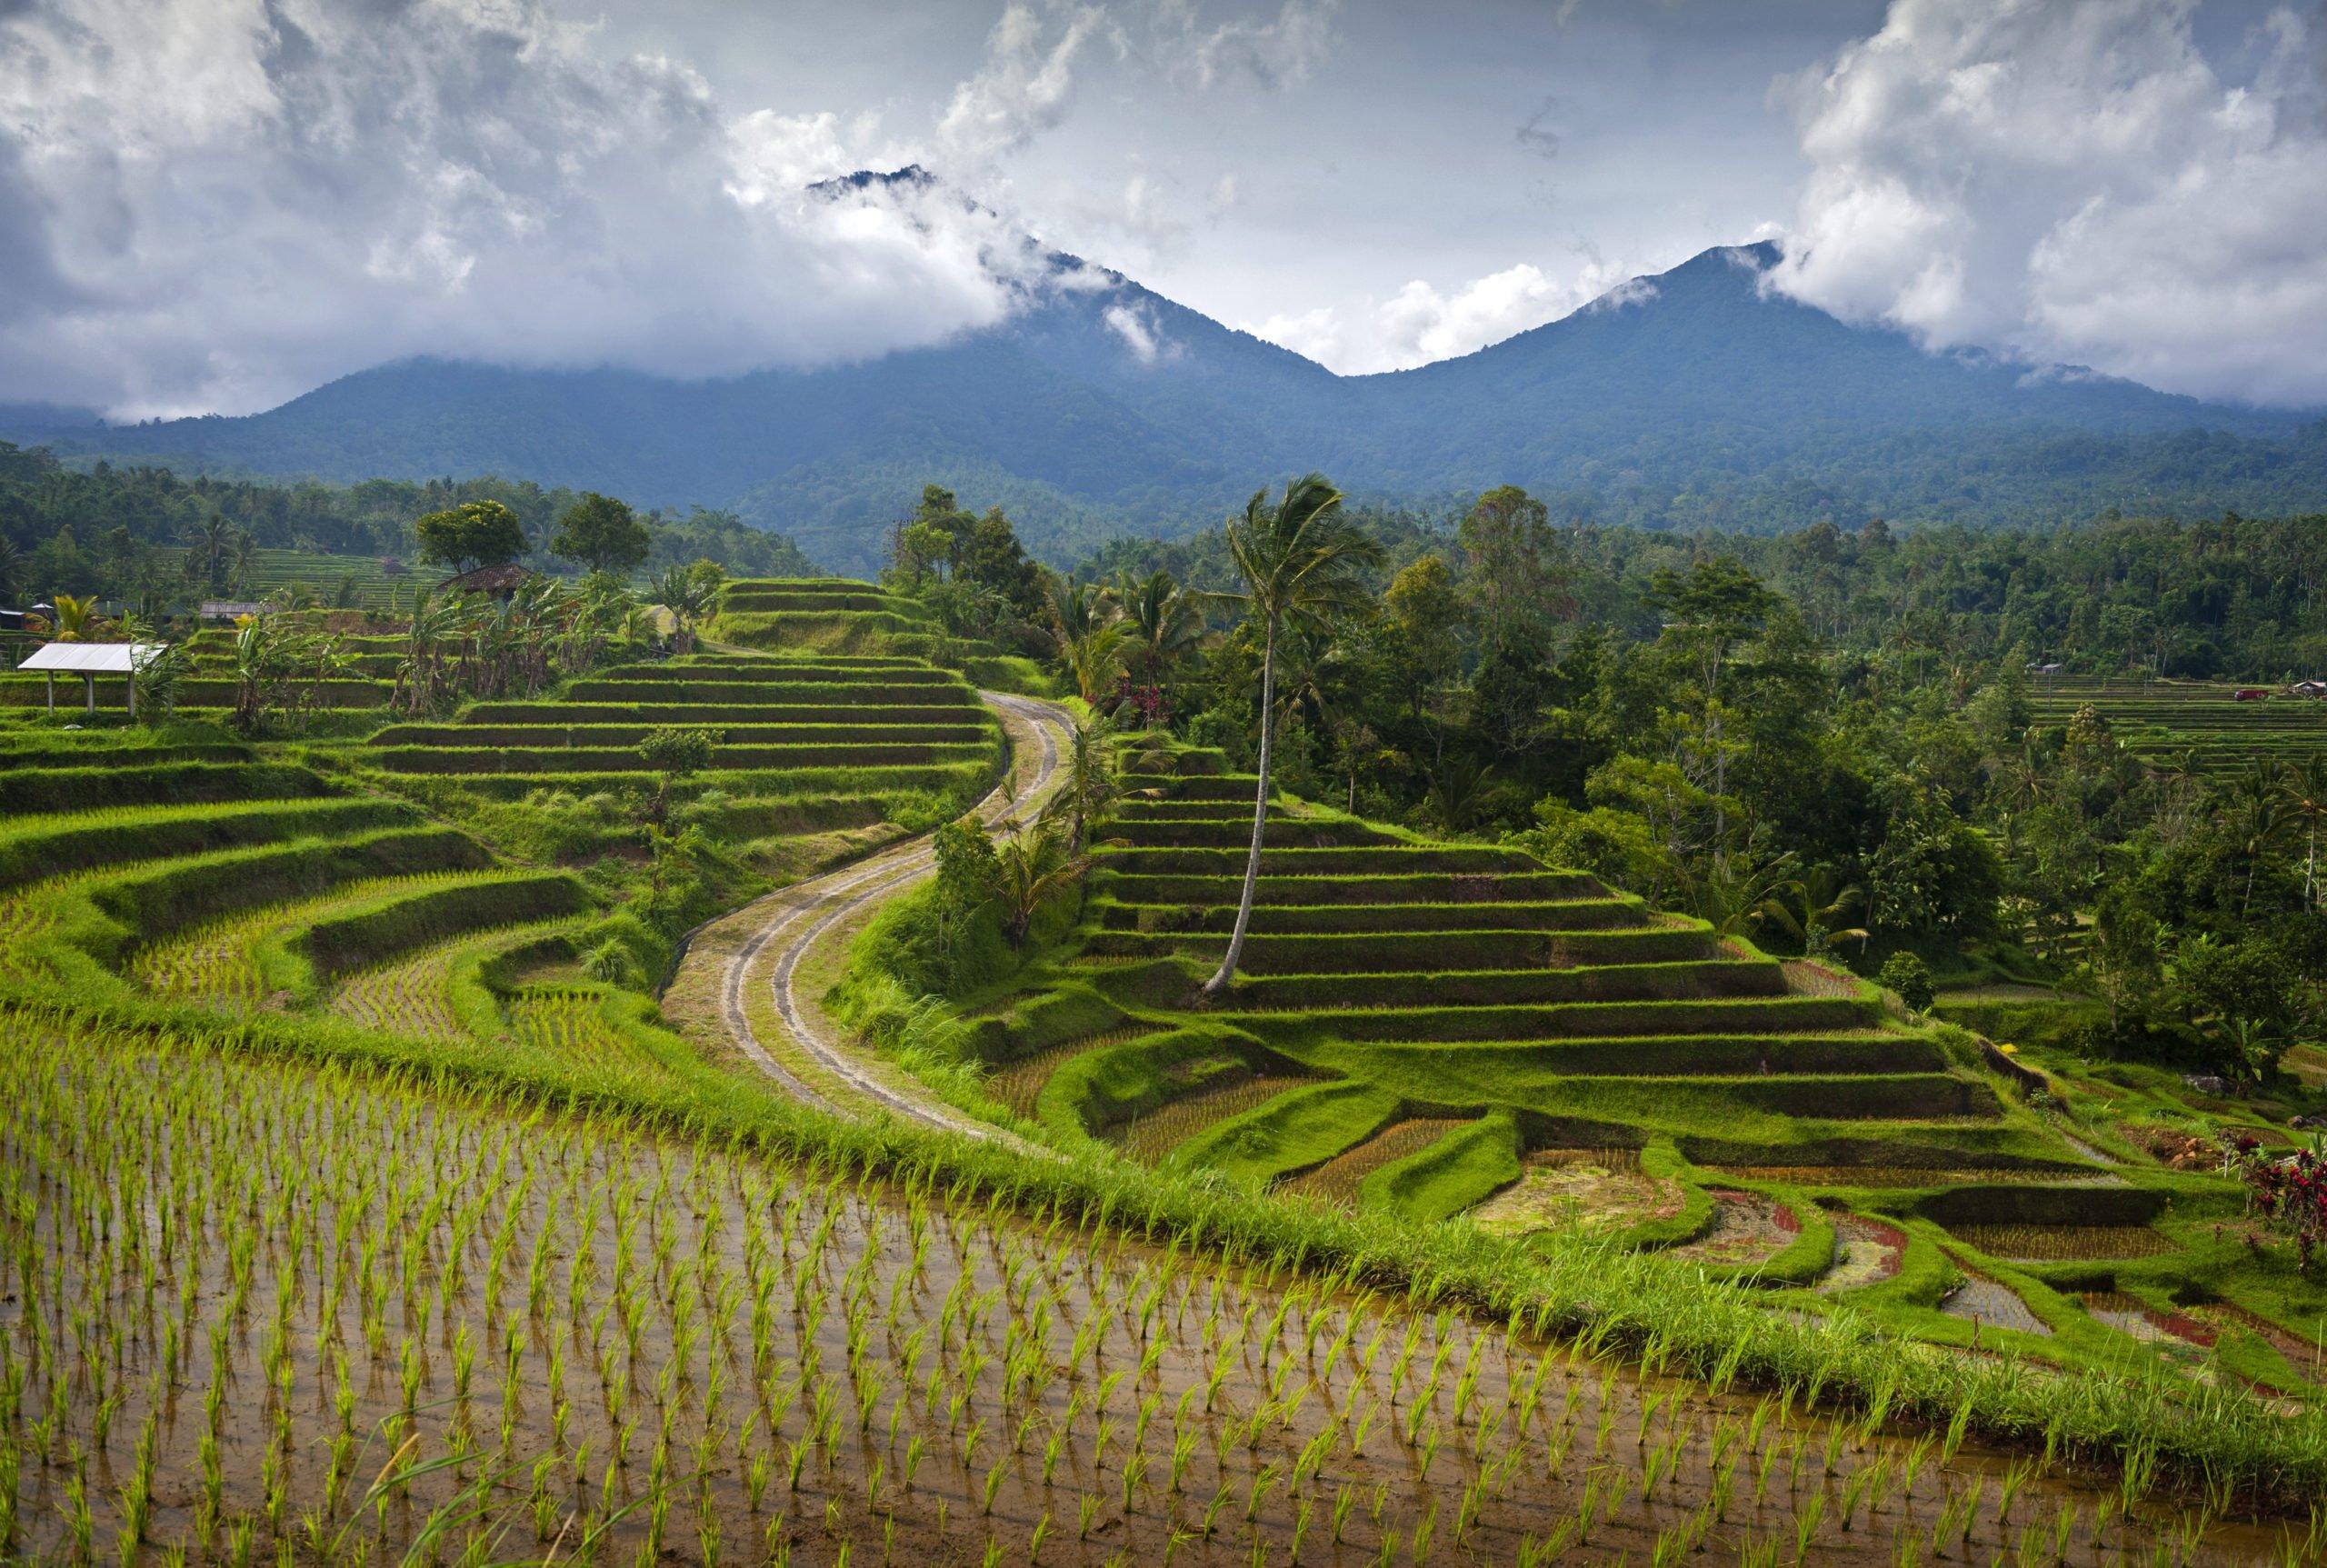 Visit The Unesco World Heritage Site Of Jatiluwih Rice Terrace On The Cultural Heritage Tour From Ubud, Sanur, Nusa Dua, Tanjung Benoa, Seminyak